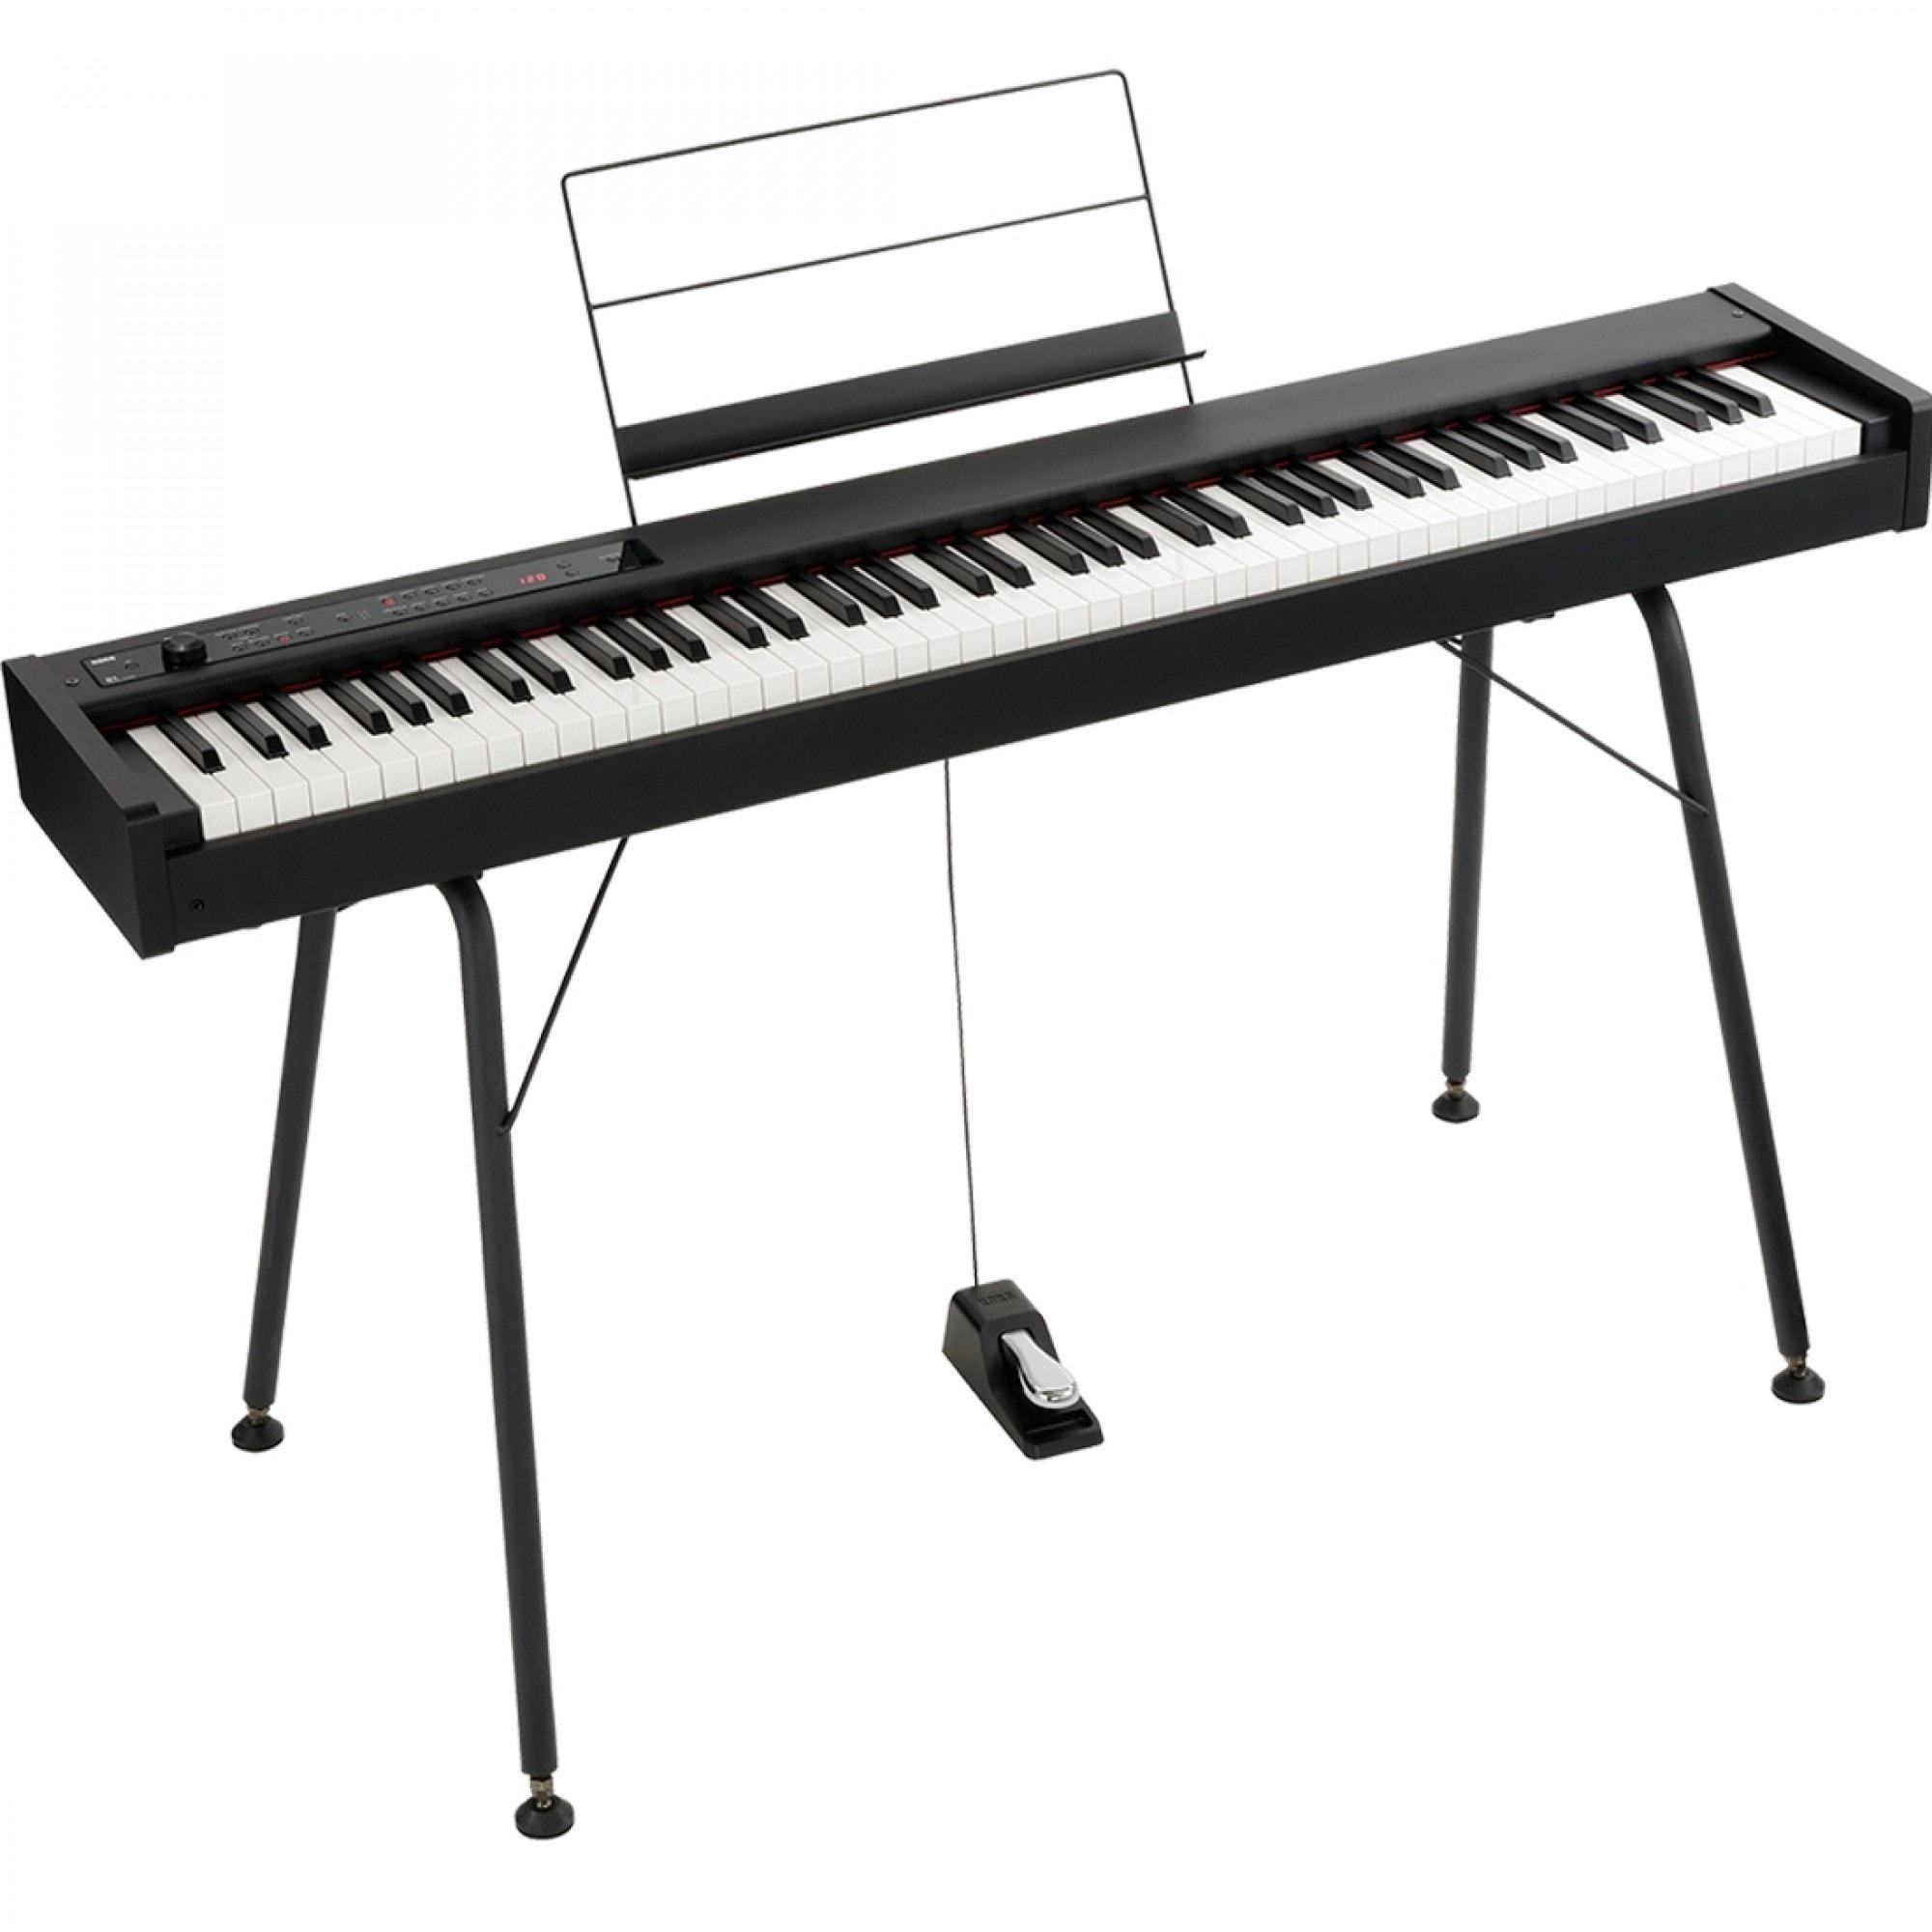 Digital Piano Korg D1 : korg d1 digital piano 88 key dj city ~ Russianpoet.info Haus und Dekorationen